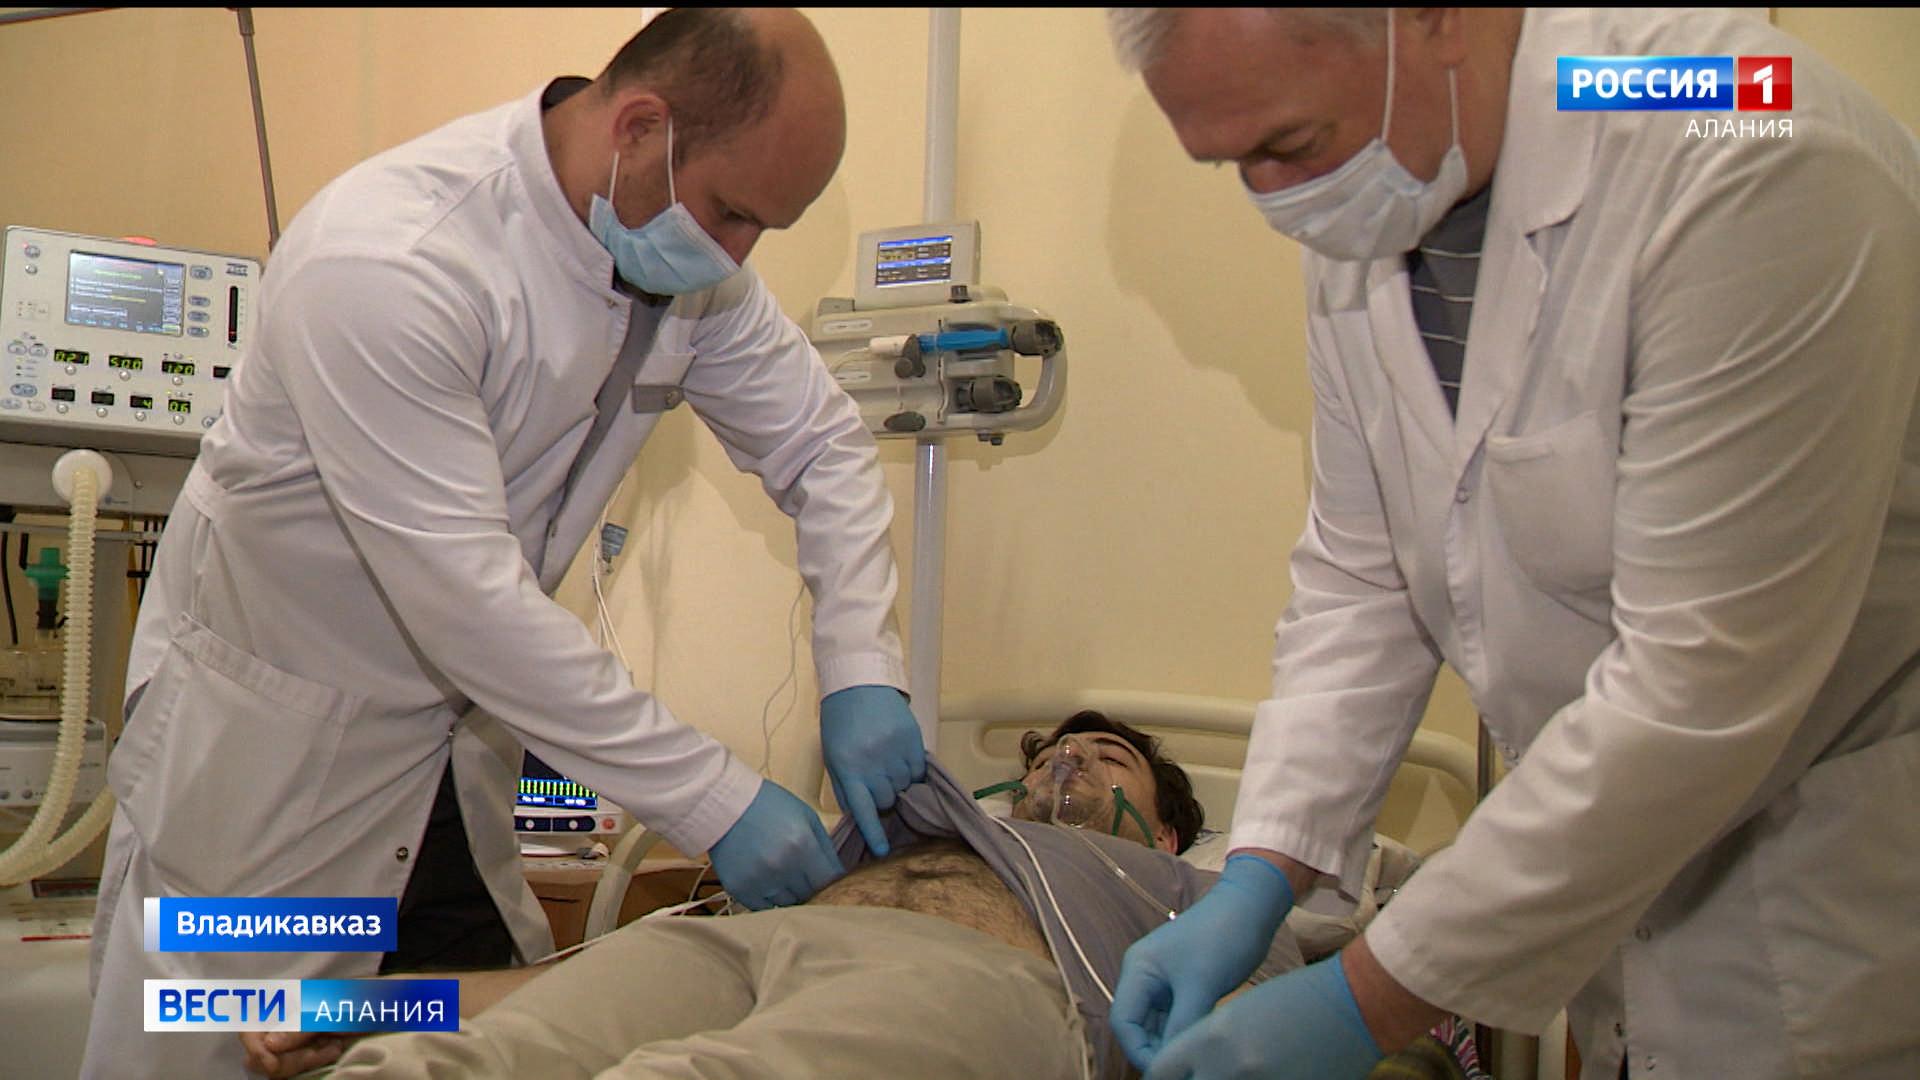 В СОГМА разработали методику лечения коронавируса